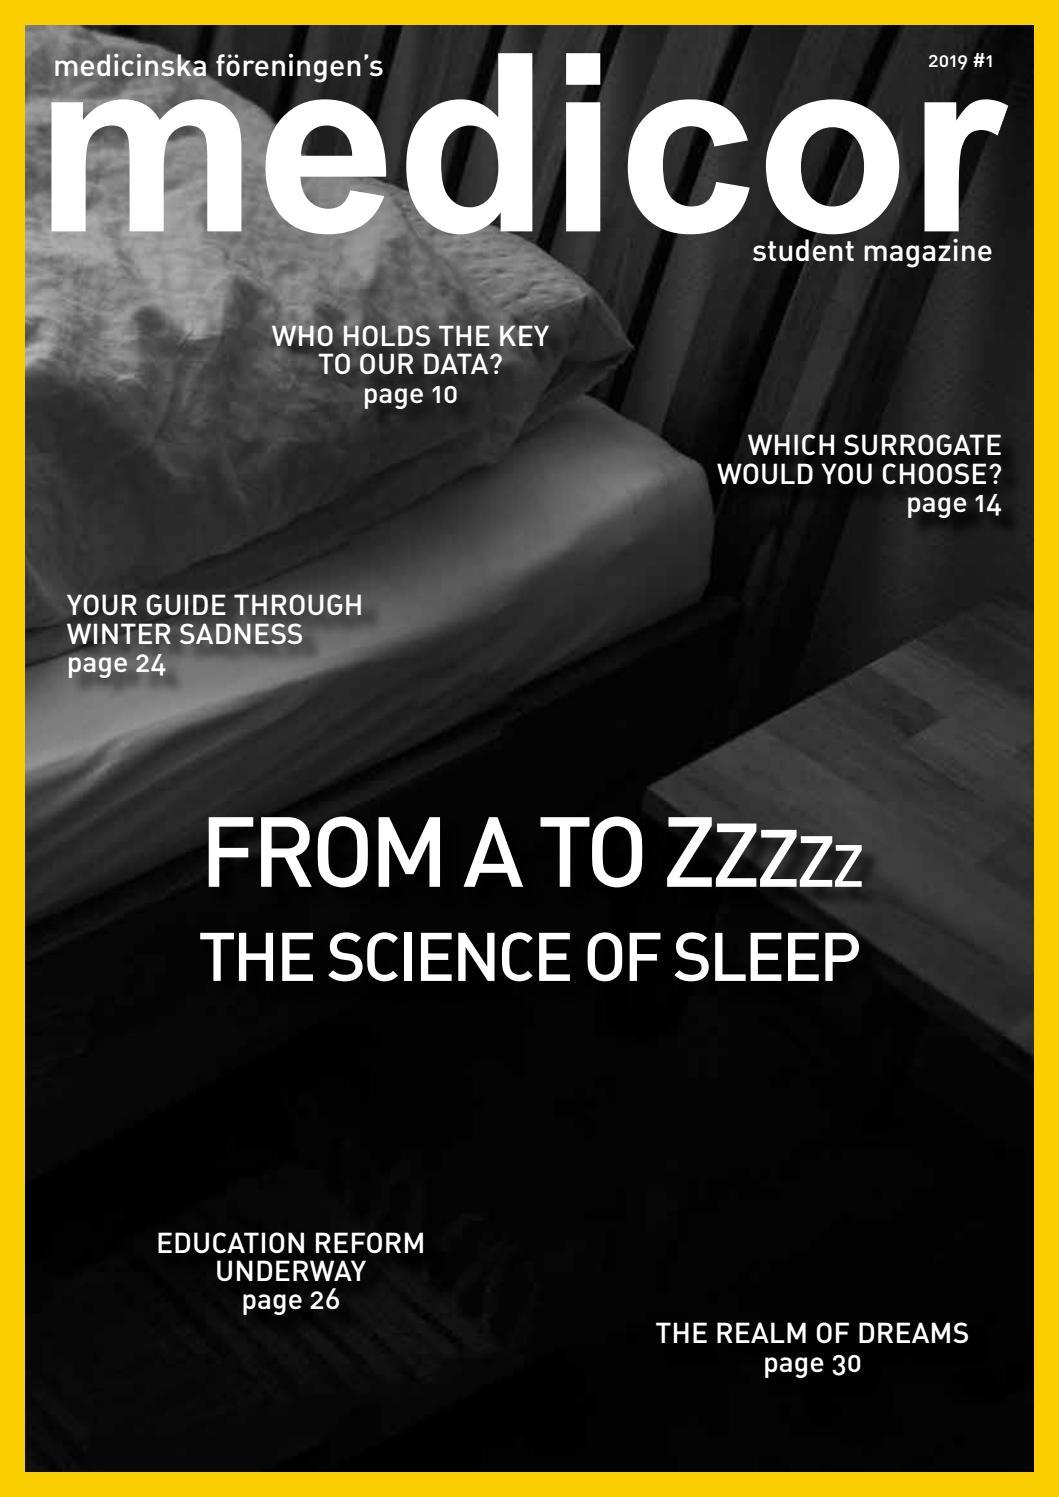 Medicor 2019 #1 by Medicor MF Magazine - issuu